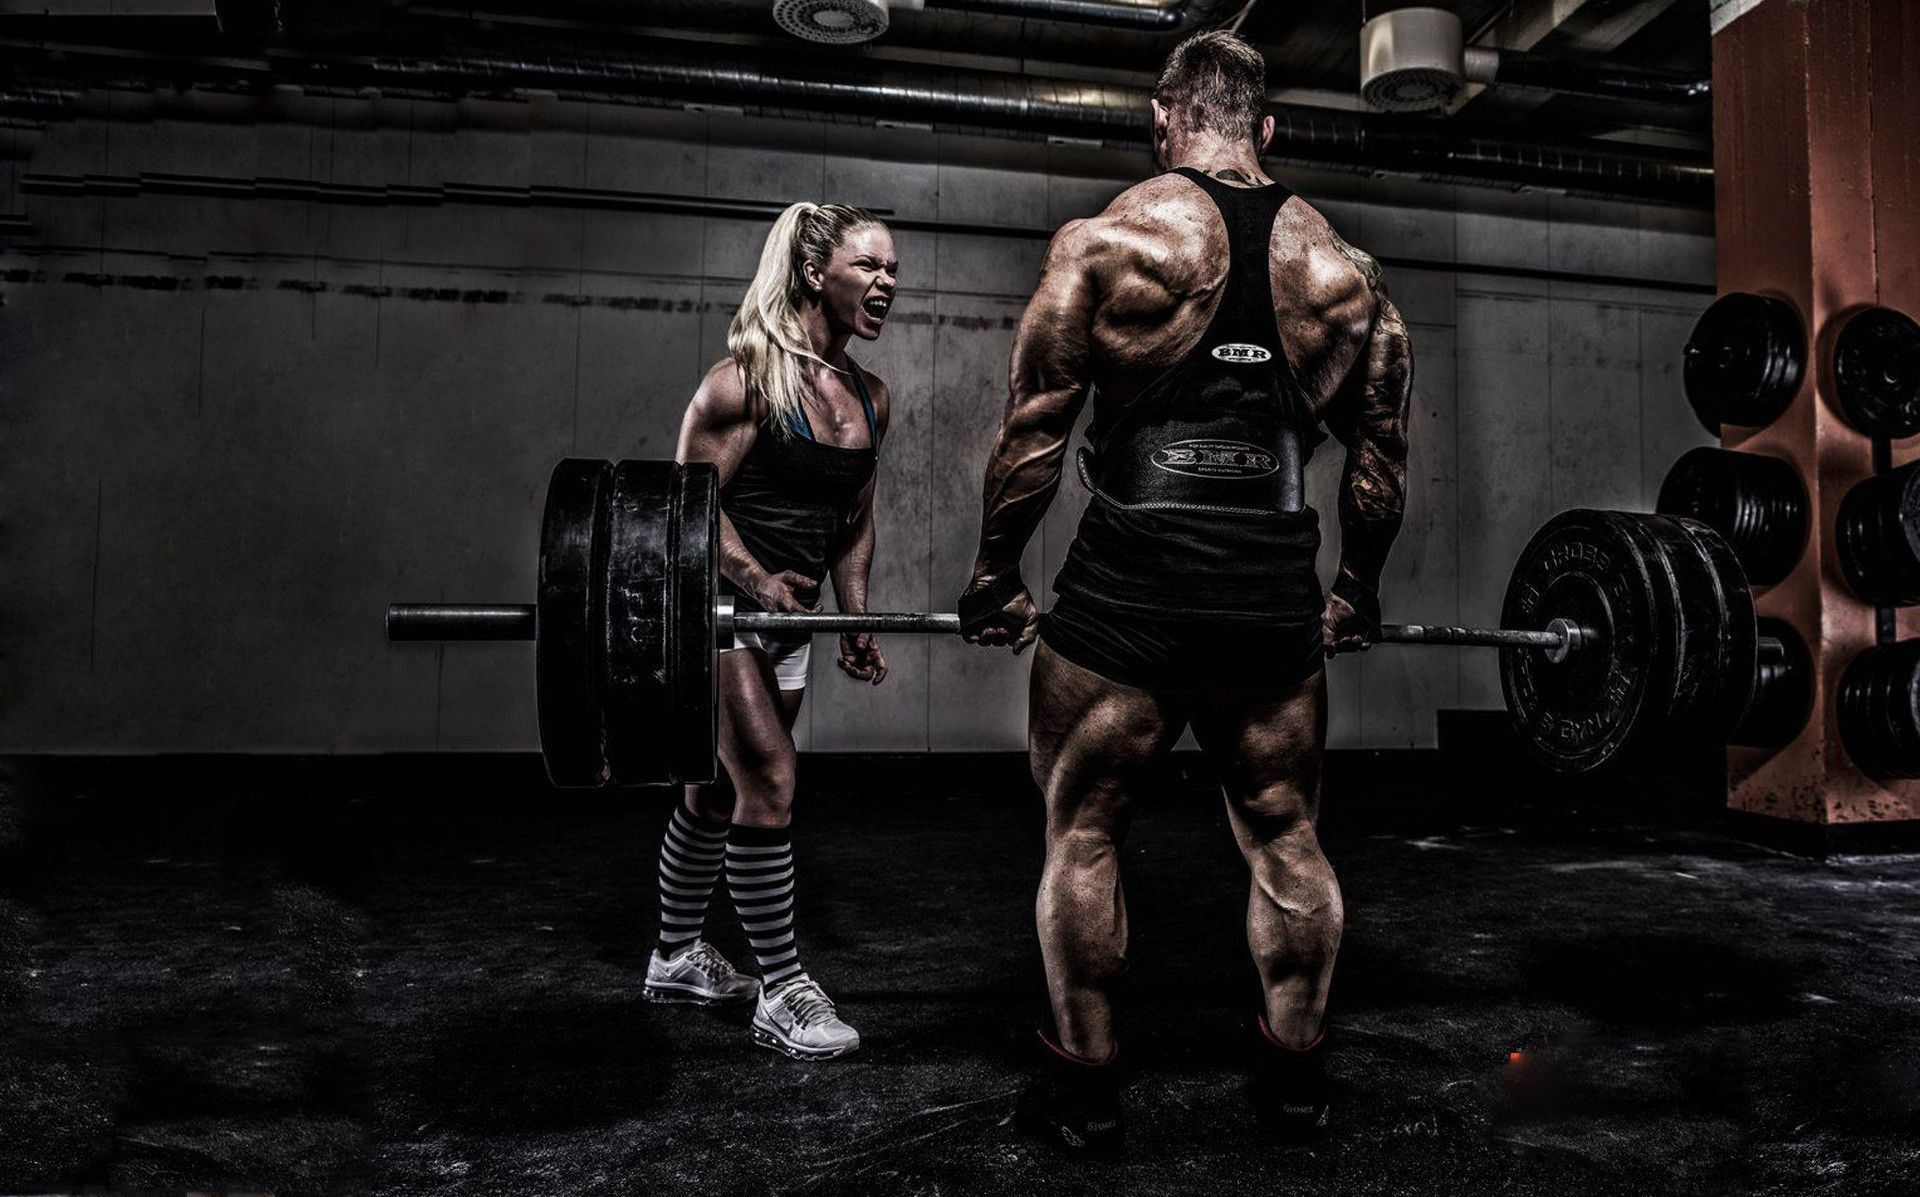 women fitness wallpaper, women fitness motivation pictures